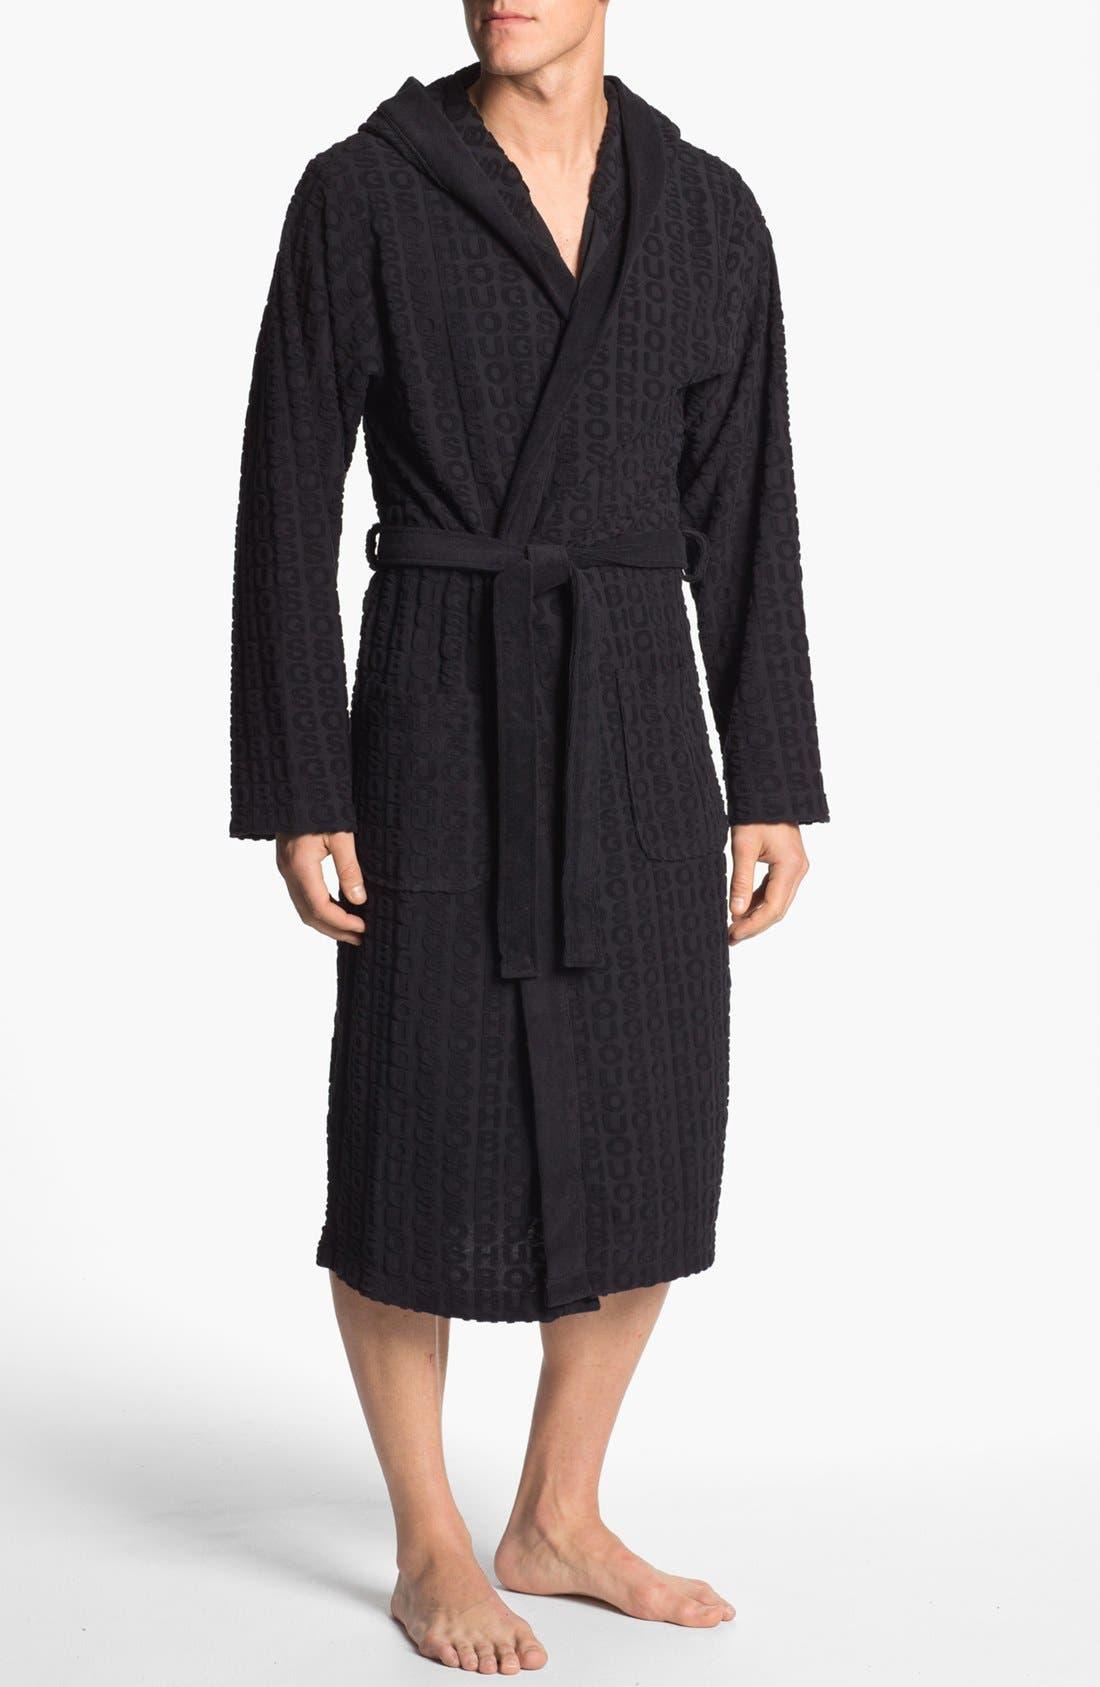 HUGO BOSS 'Innovation 3' Robe, Main, color, 001